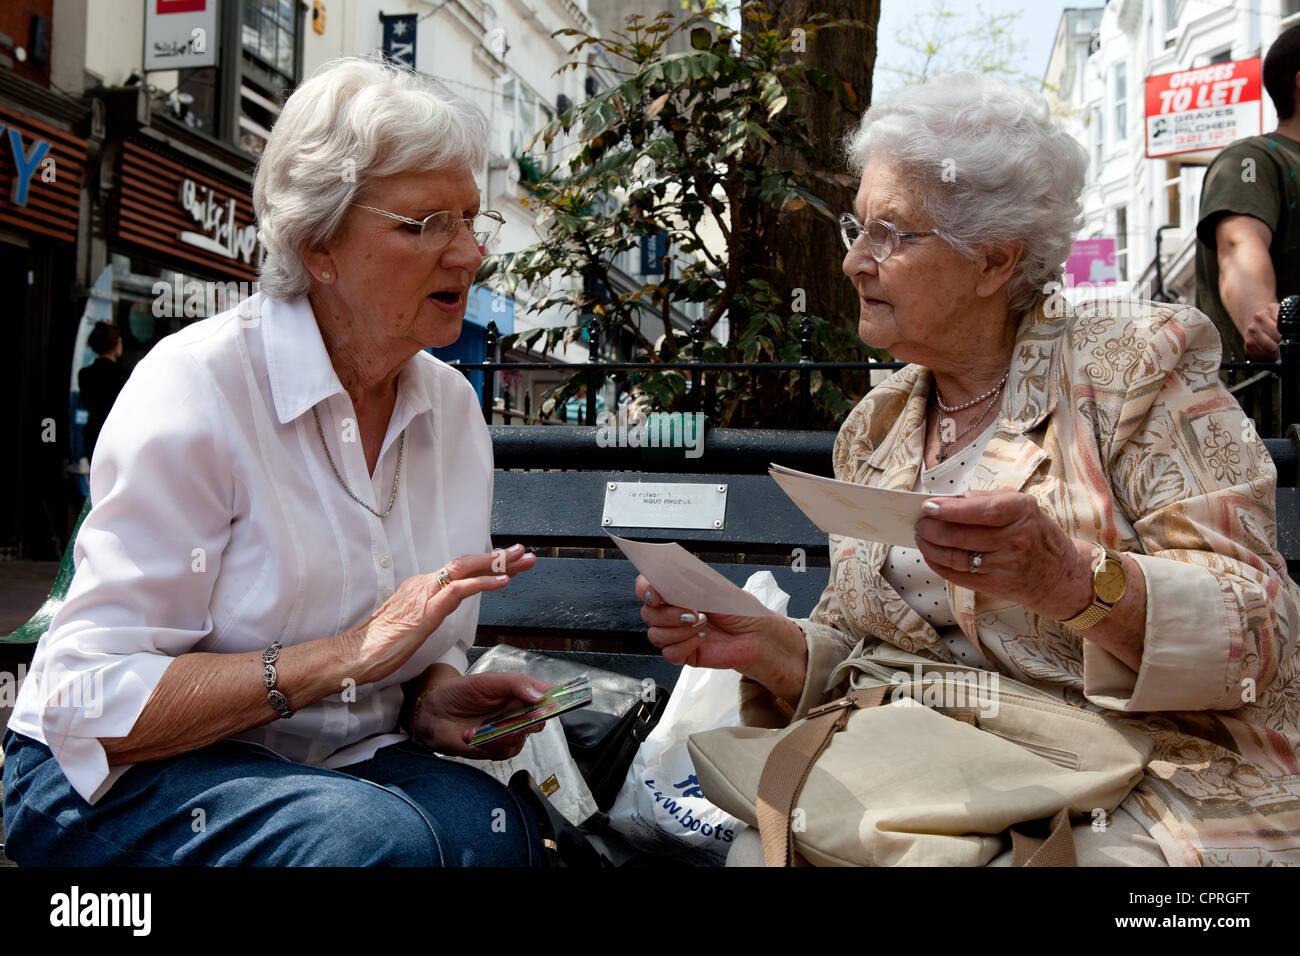 Alte Freunde im Gespräch Stockbild